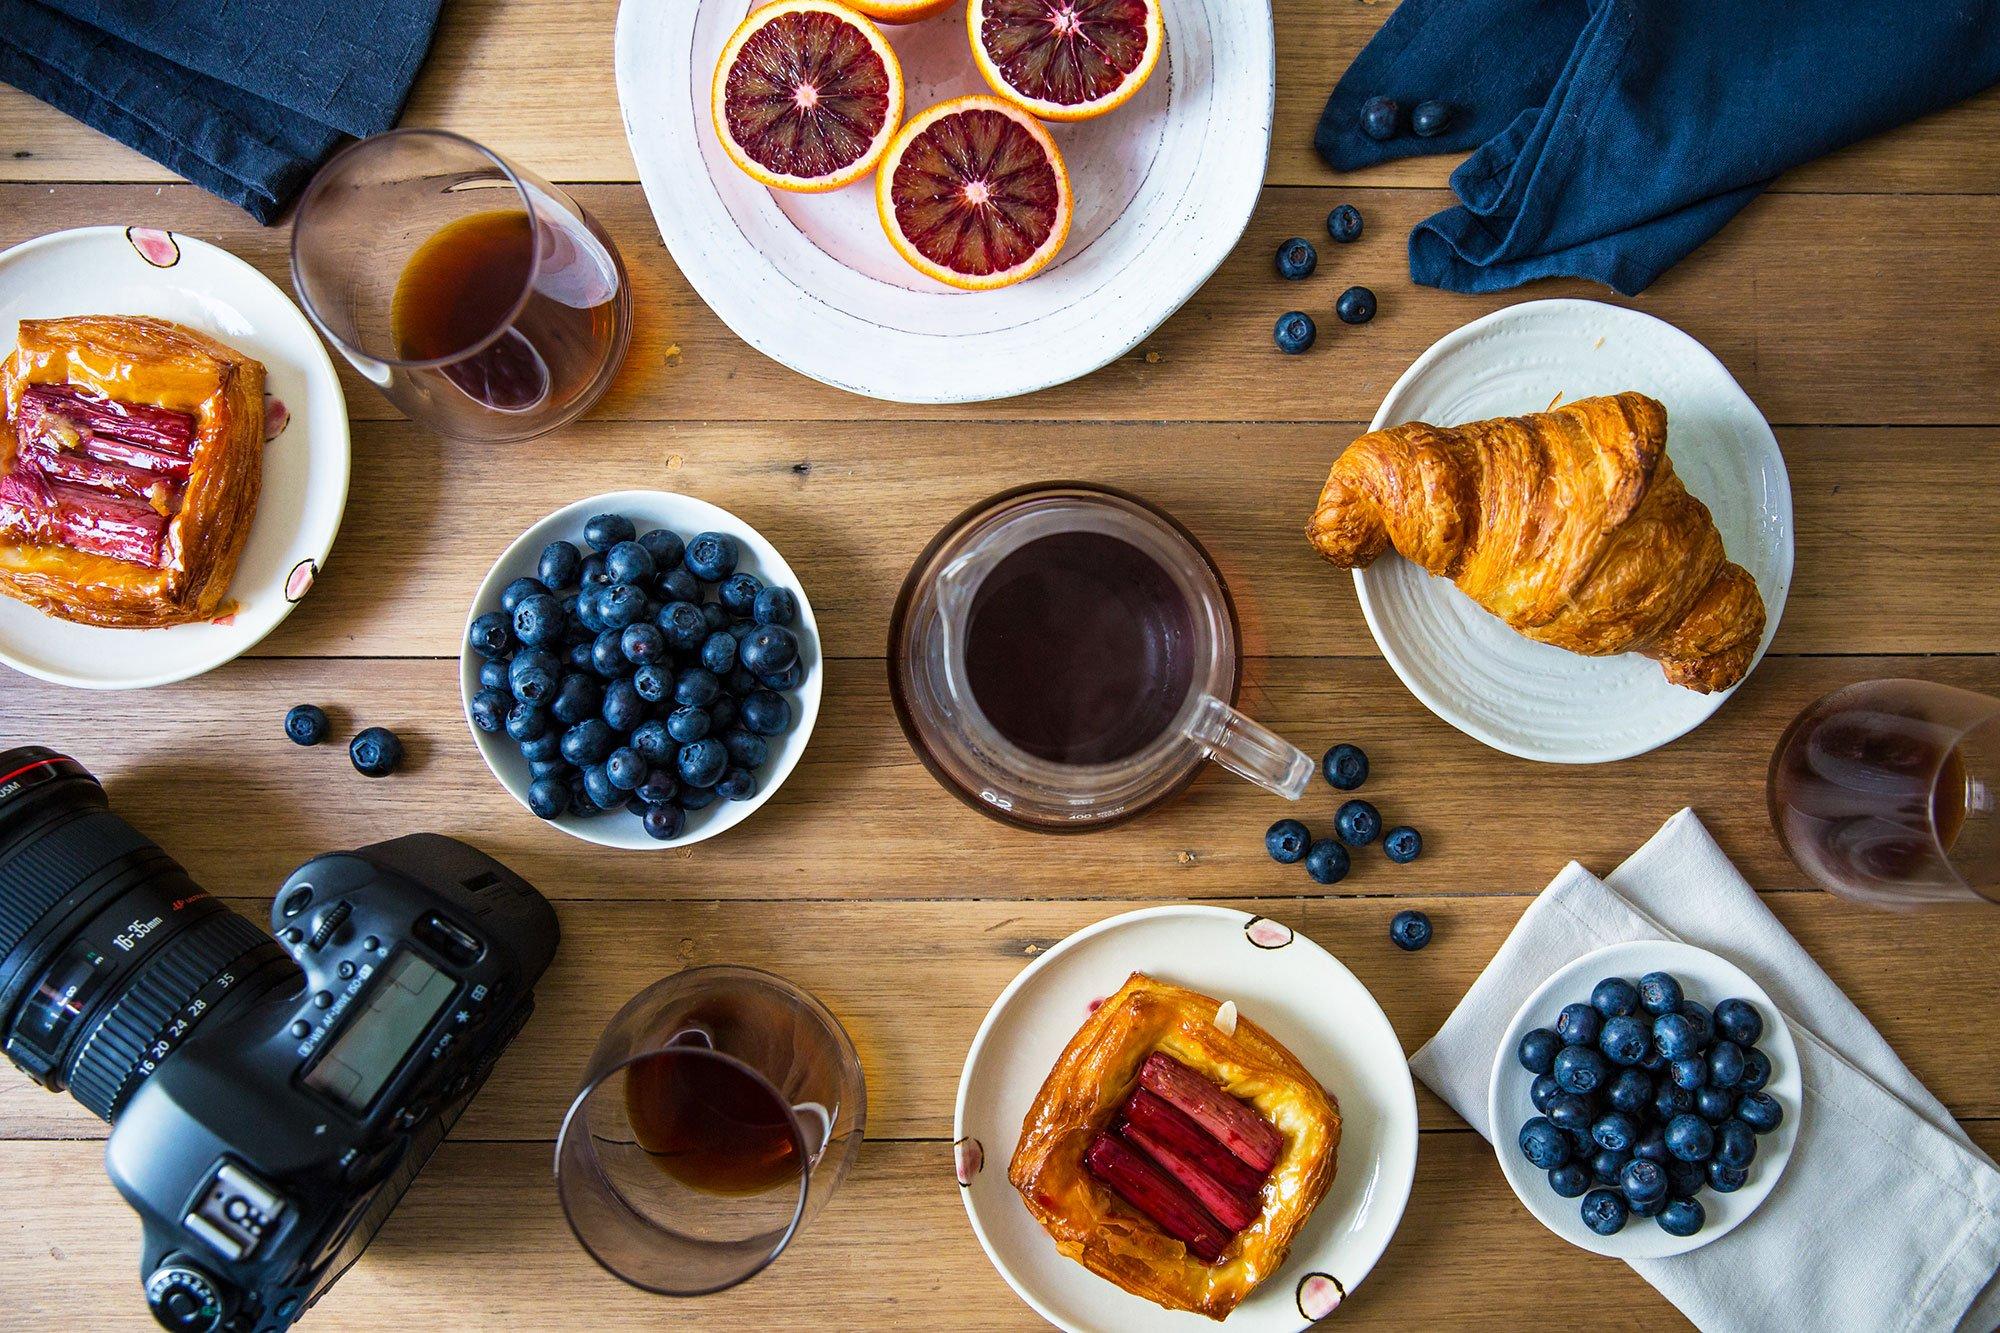 Food P Ography And Styling Workshop Short Course Le Cordon Bleu Adelaide Australia